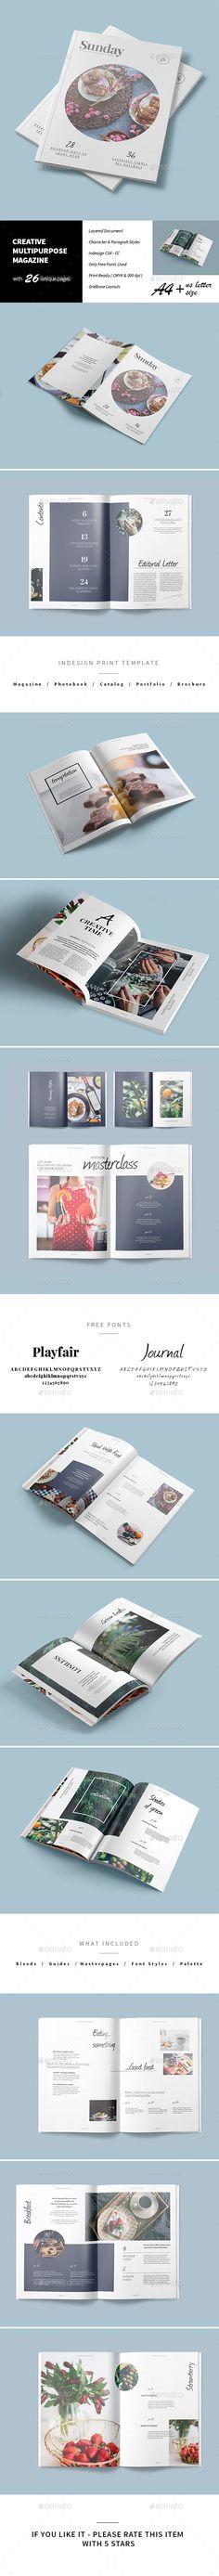 Magazine & Portfolio + Lookbook Template InDesign INDD. Download here: http://graphicriver.net/item/multipurpose-magazine/16516900?ref=ksioks